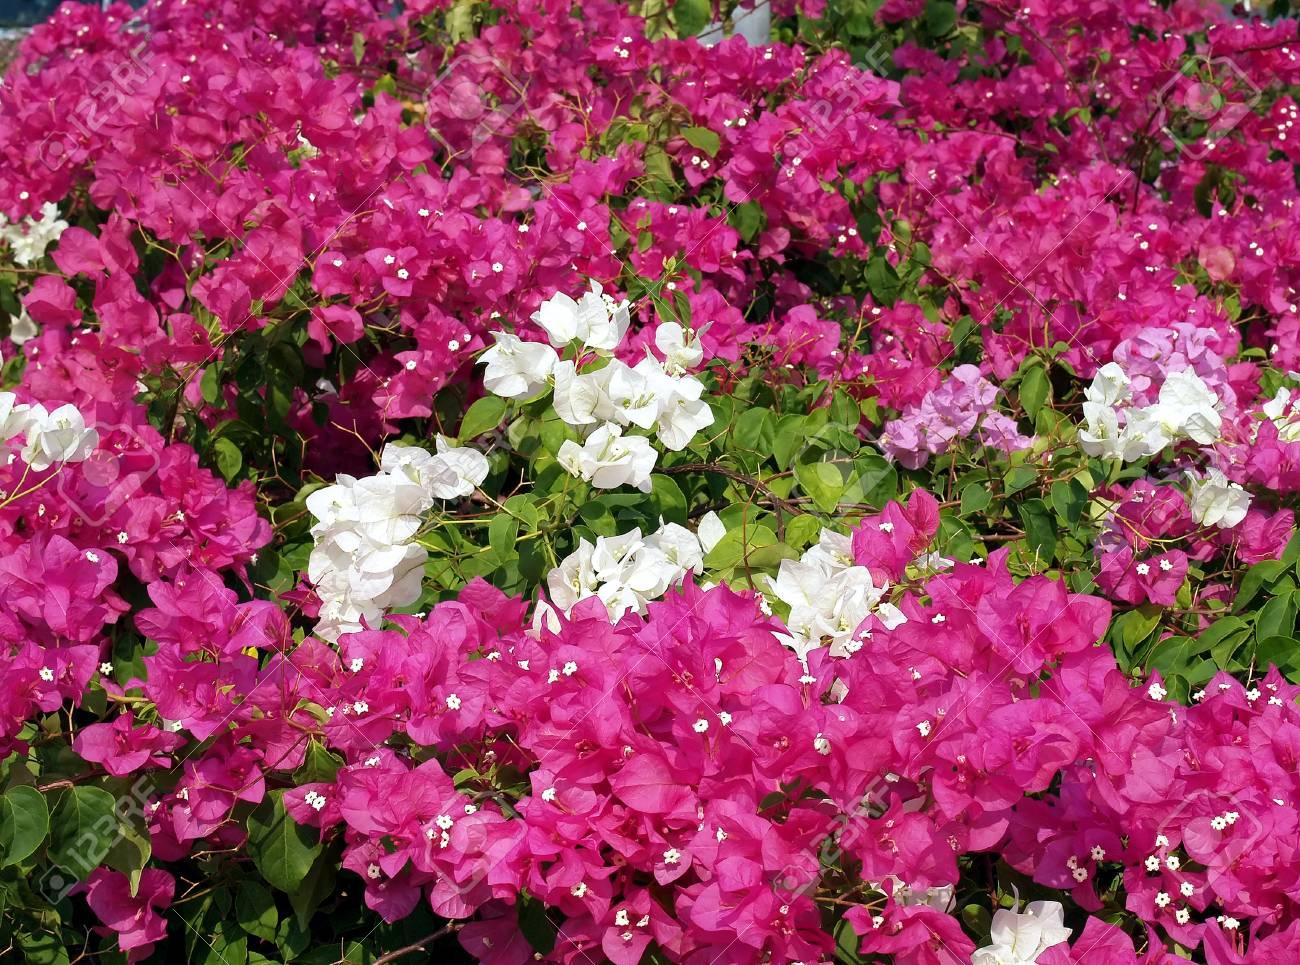 Purple And White Flowers Colorful Bougainvillea Bush For Decorative